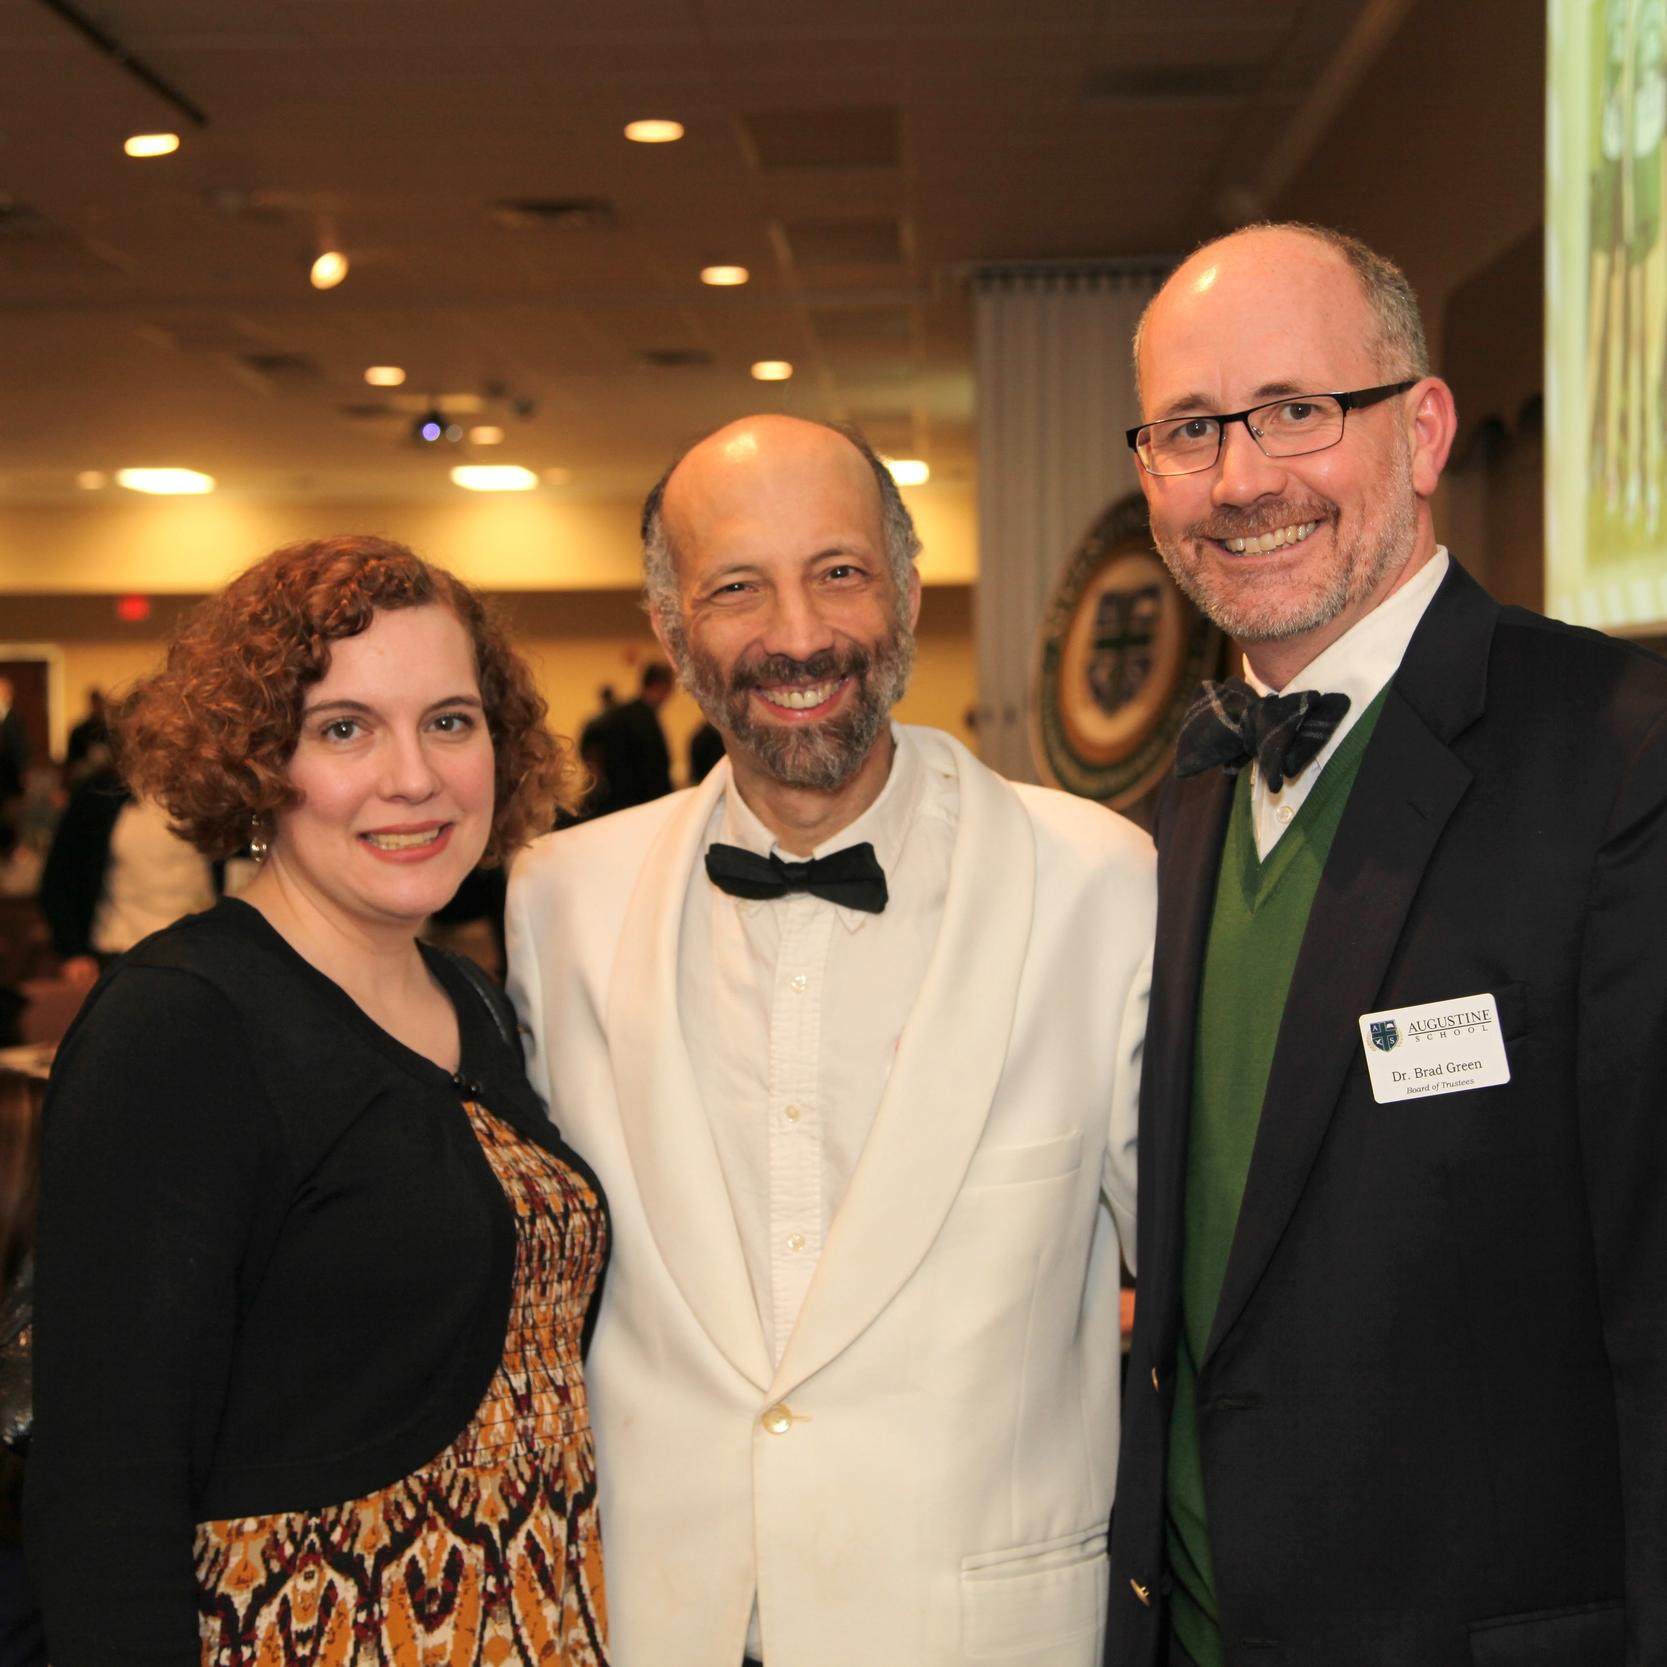 Dr. Janna Chance, Dr. Louis Markos & Dr. Brad Green